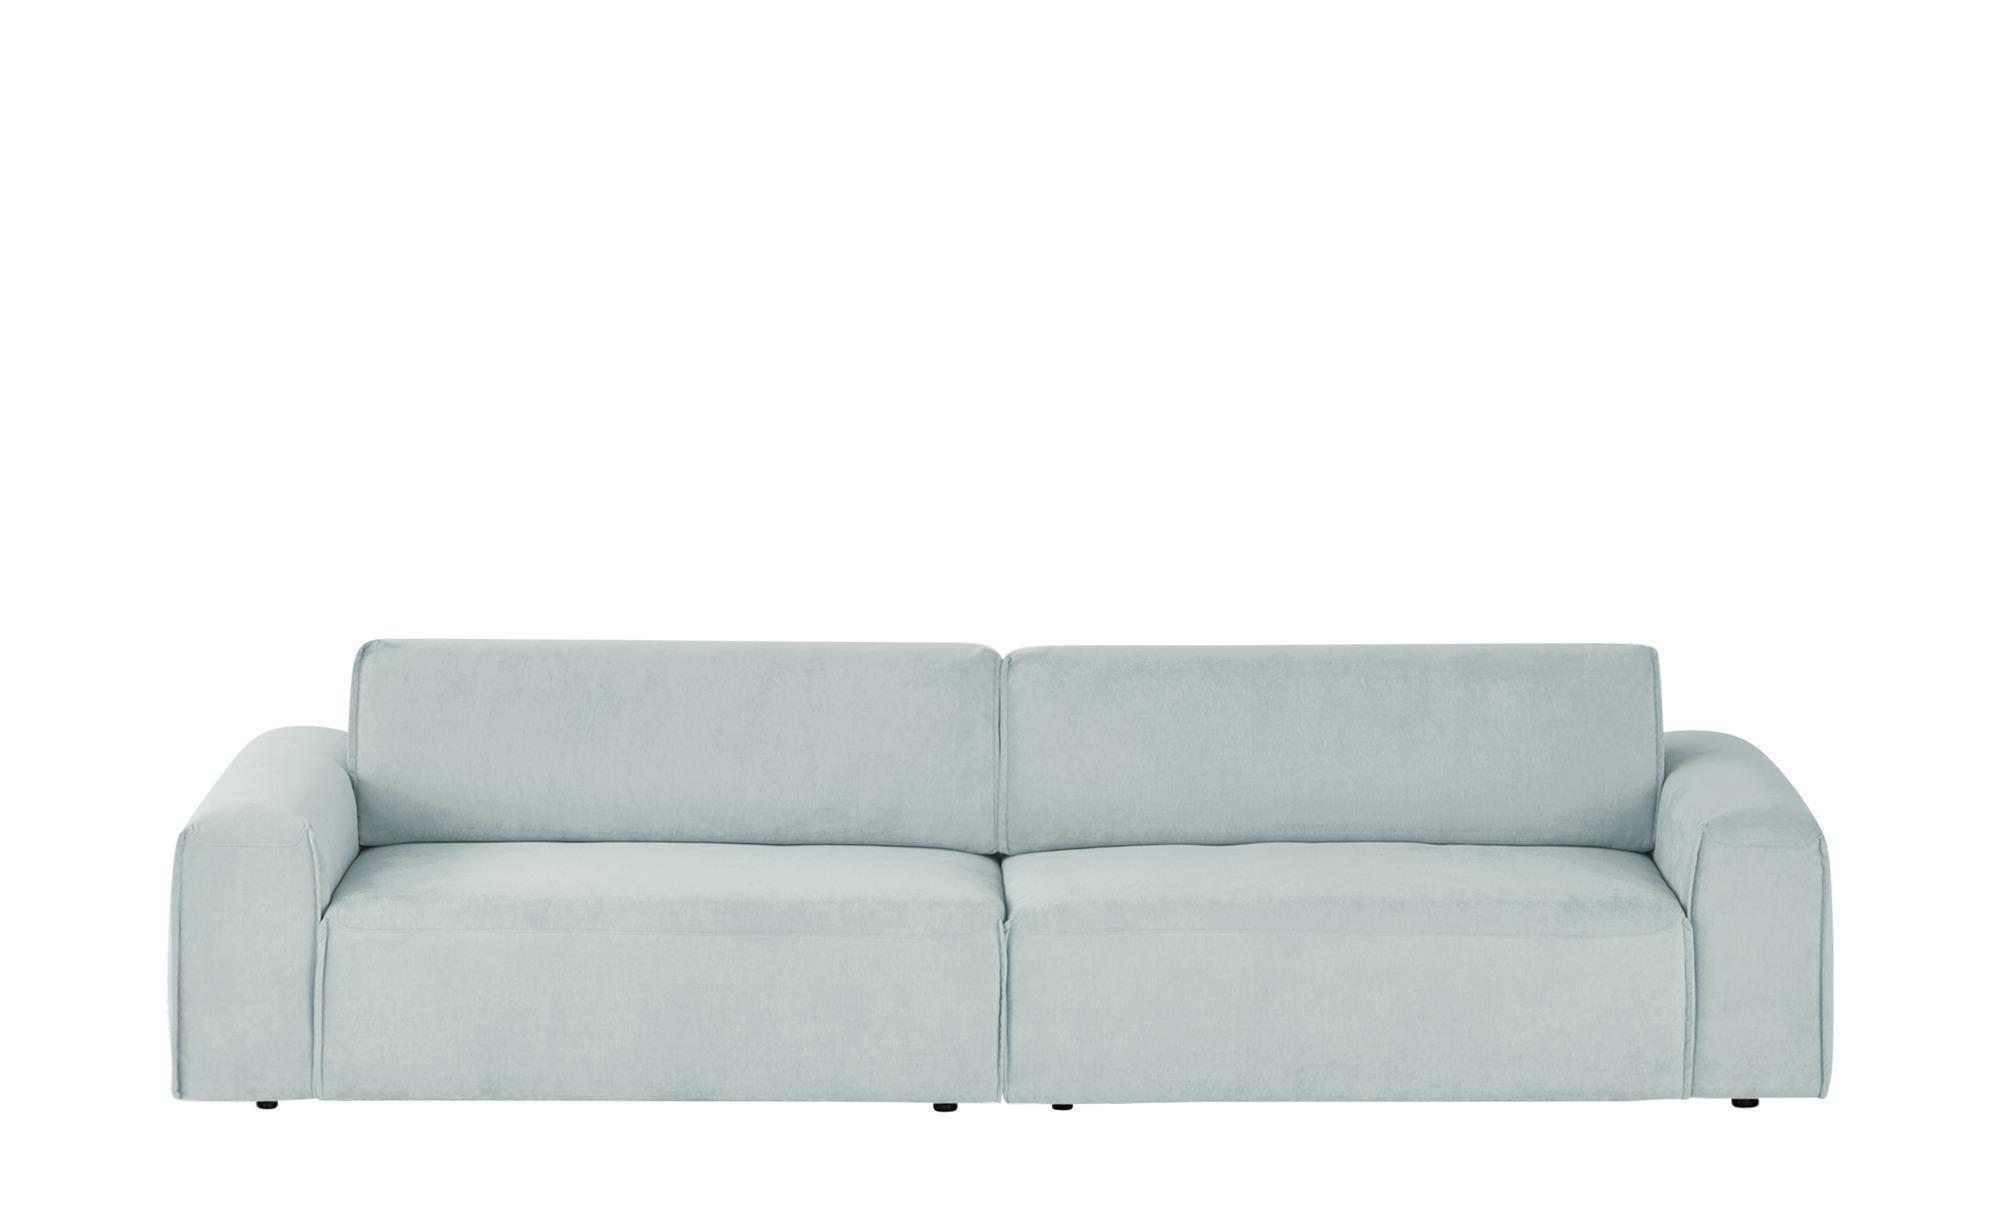 Max Schelling Big Sofa  Life ¦ blau ¦ Maße (cm): B: 296 T: 120 Polstermöbel > Sofas > Big-Sofas - Höffner